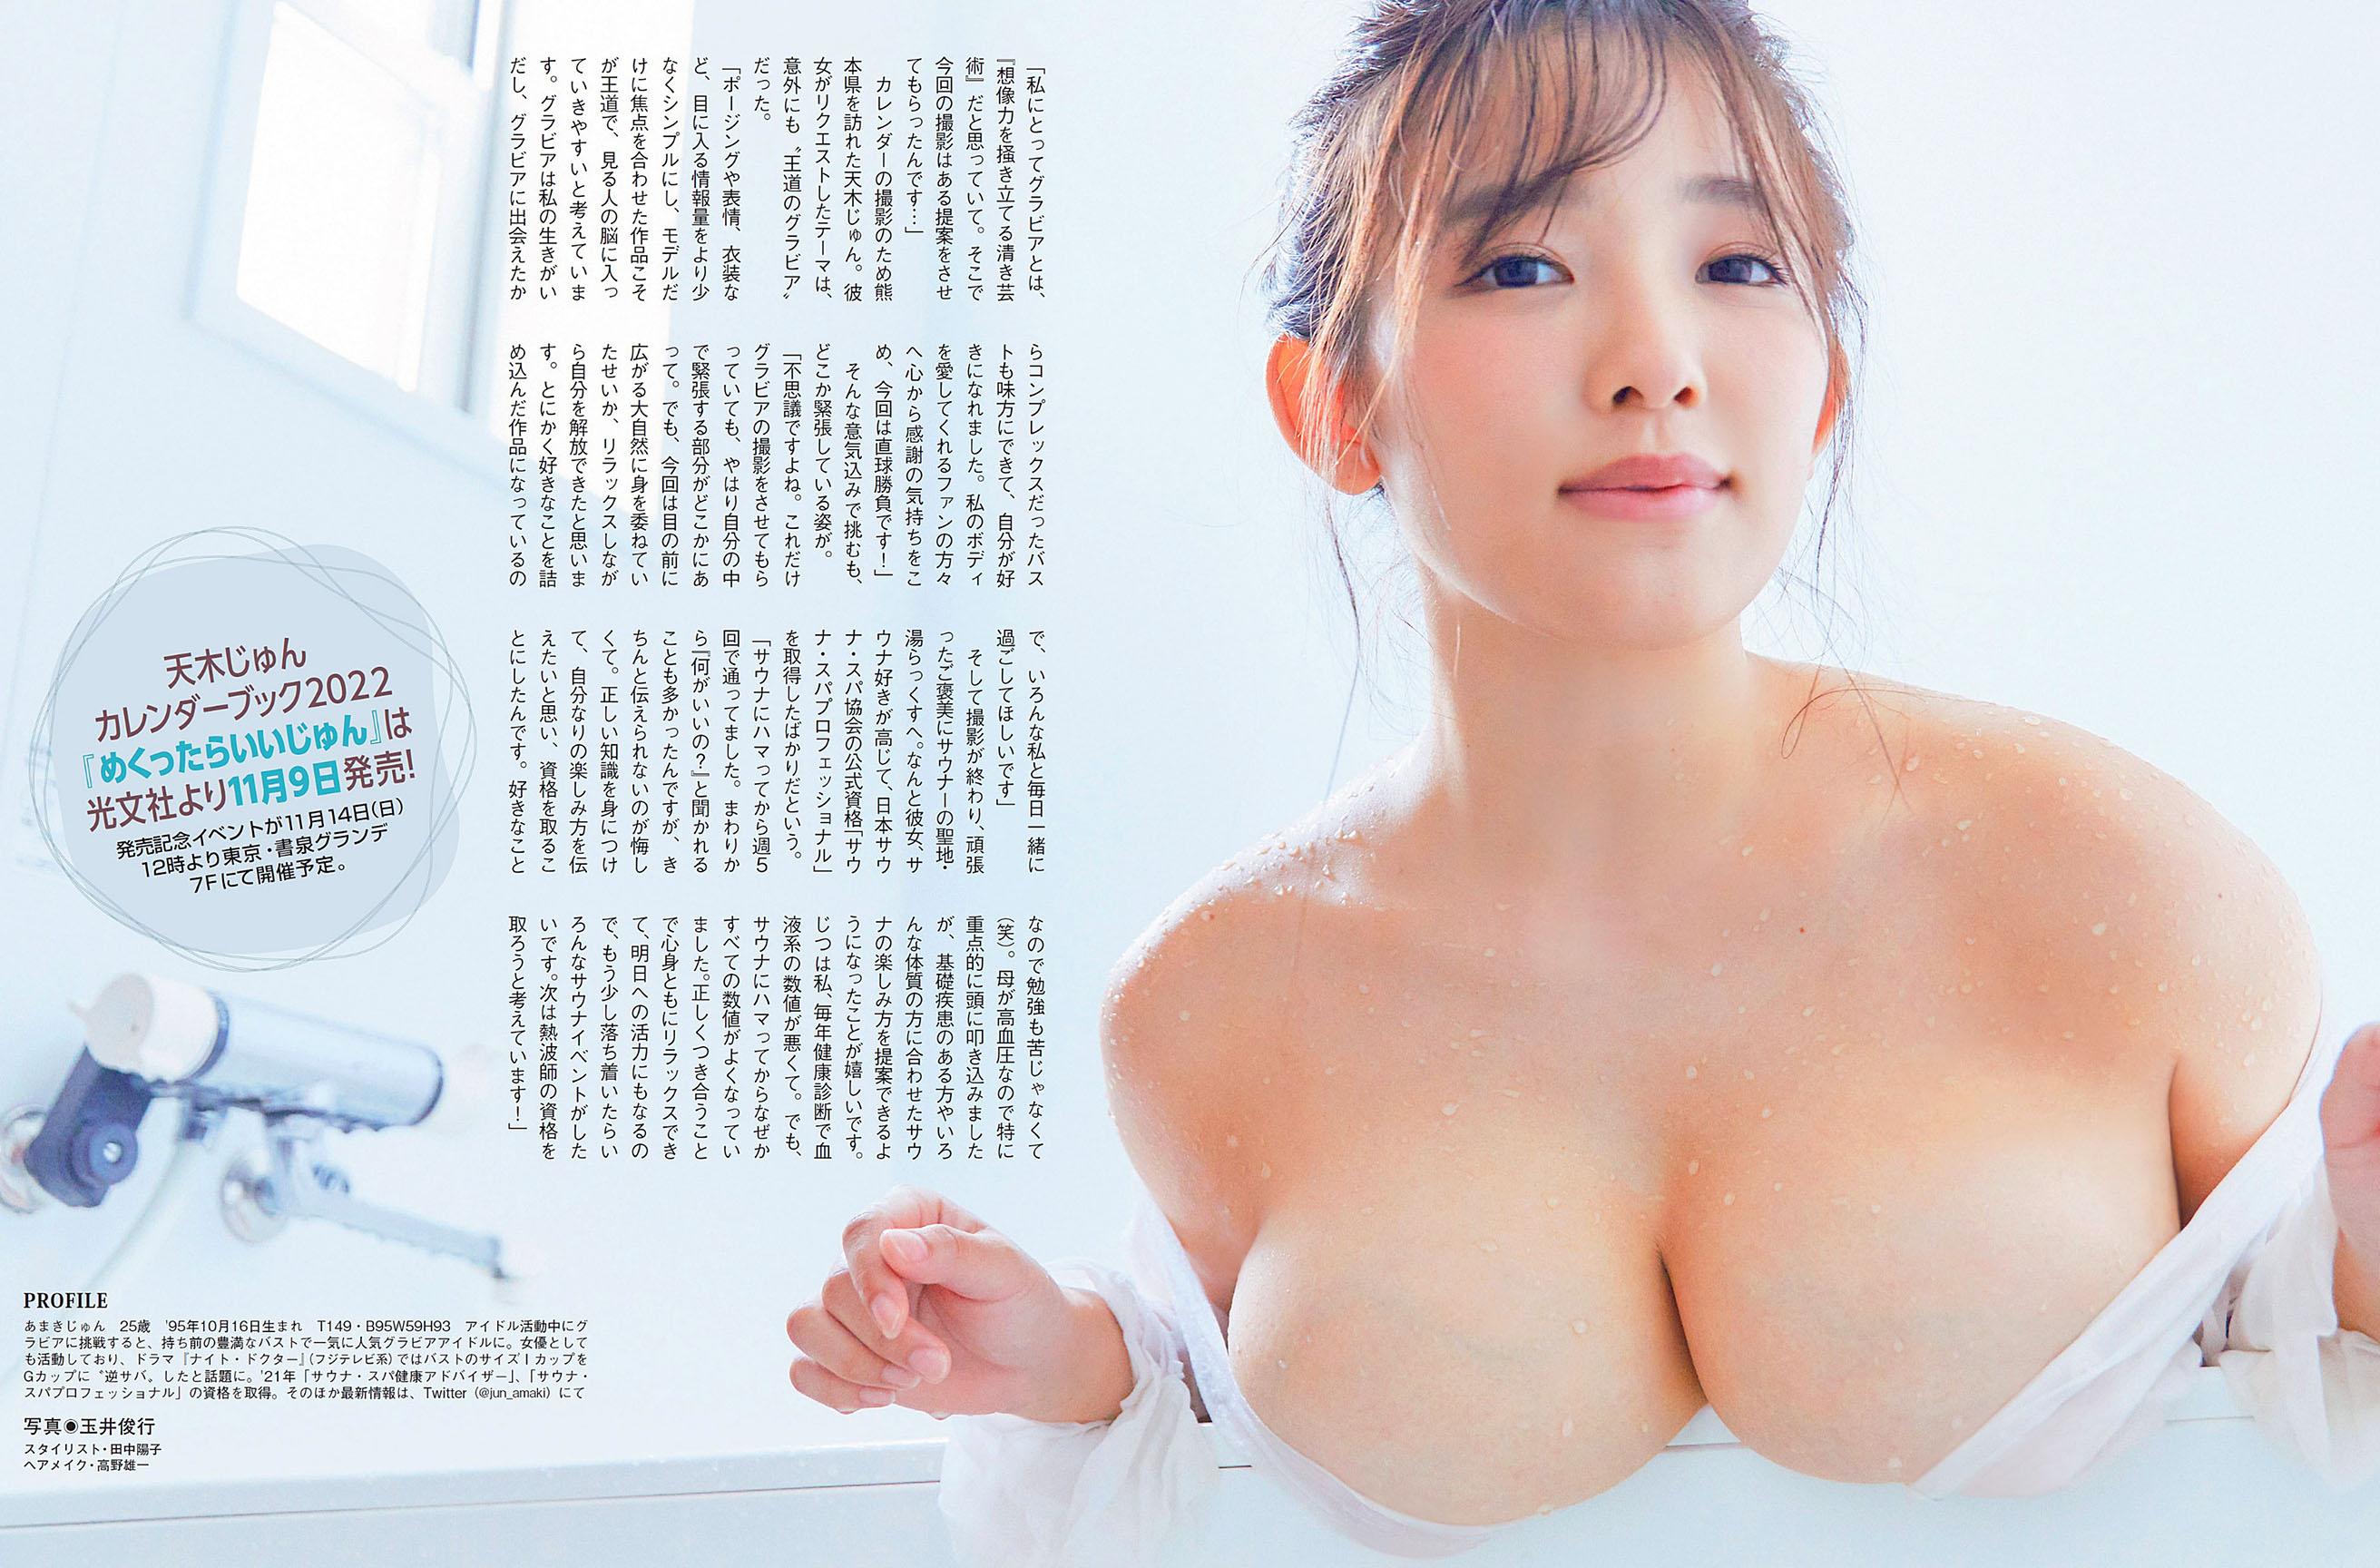 Jun Amaki Flash 211012 06.jpg